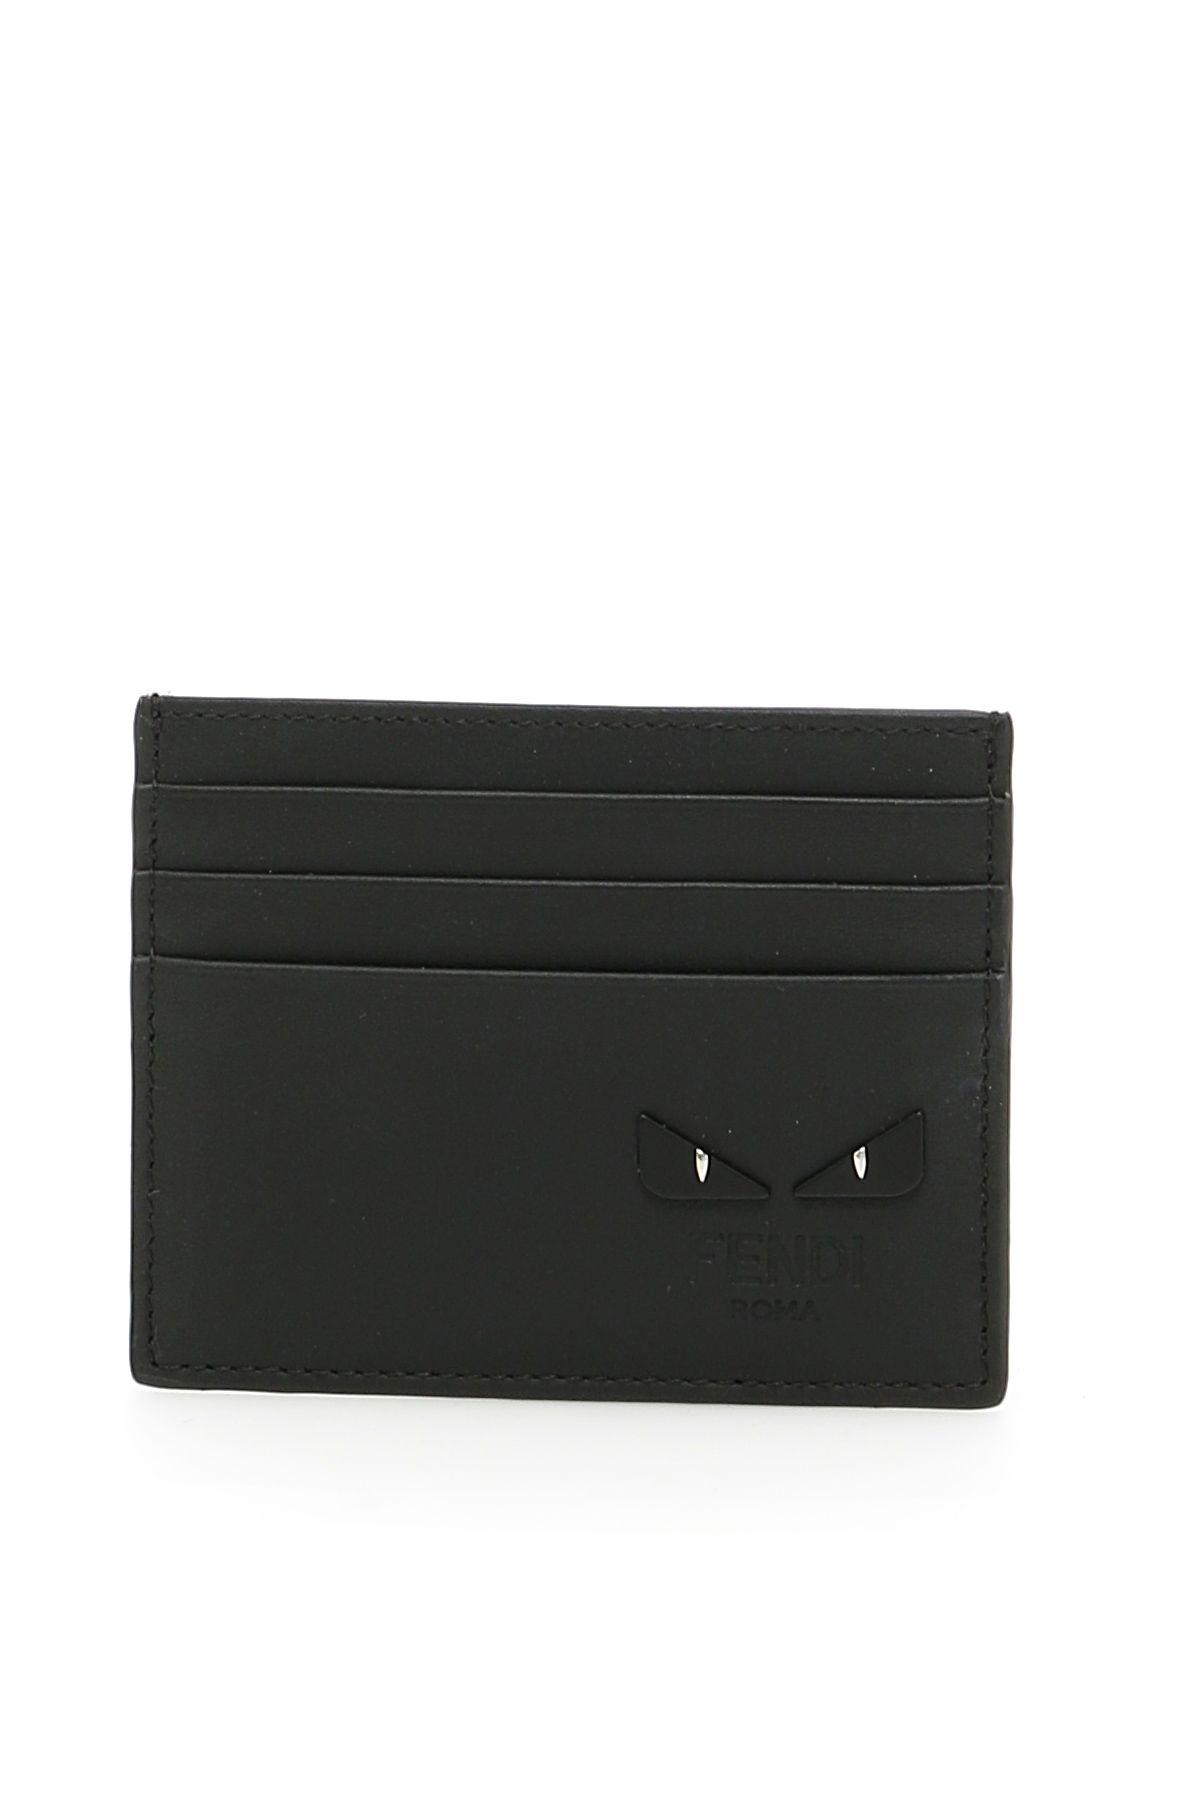 Century Calfskin Bag Bugs Cardholder